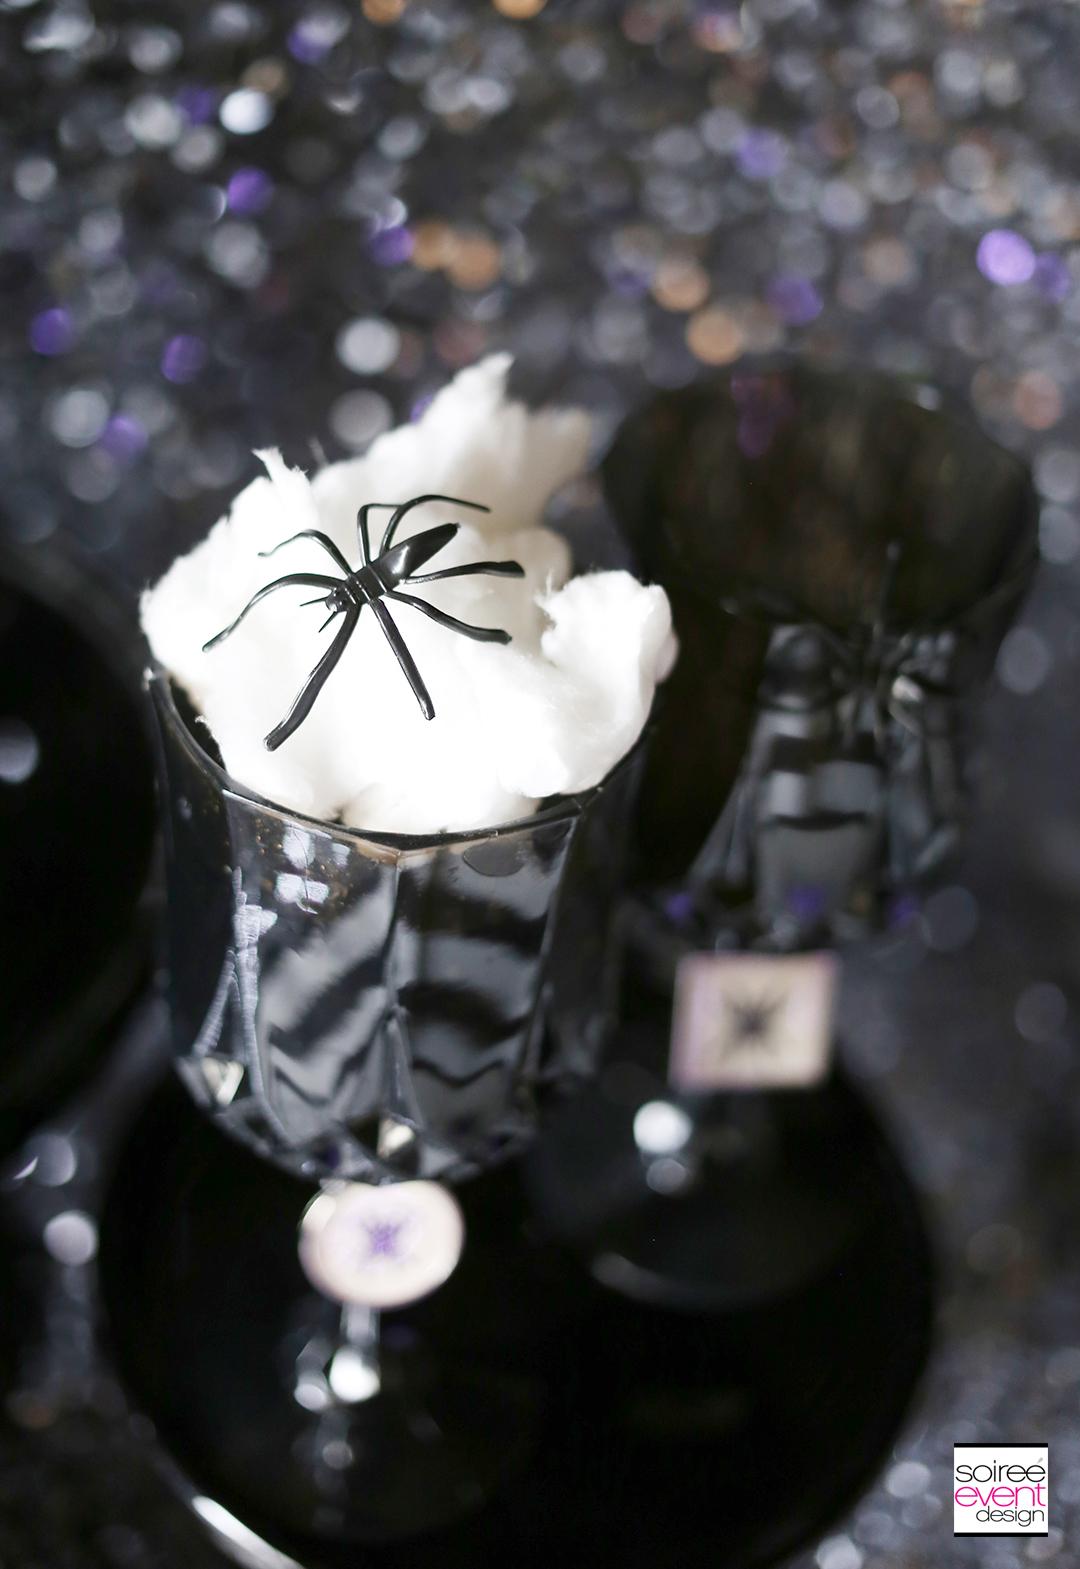 spider-web-cotton-candy-fizz-halloween-cocktail